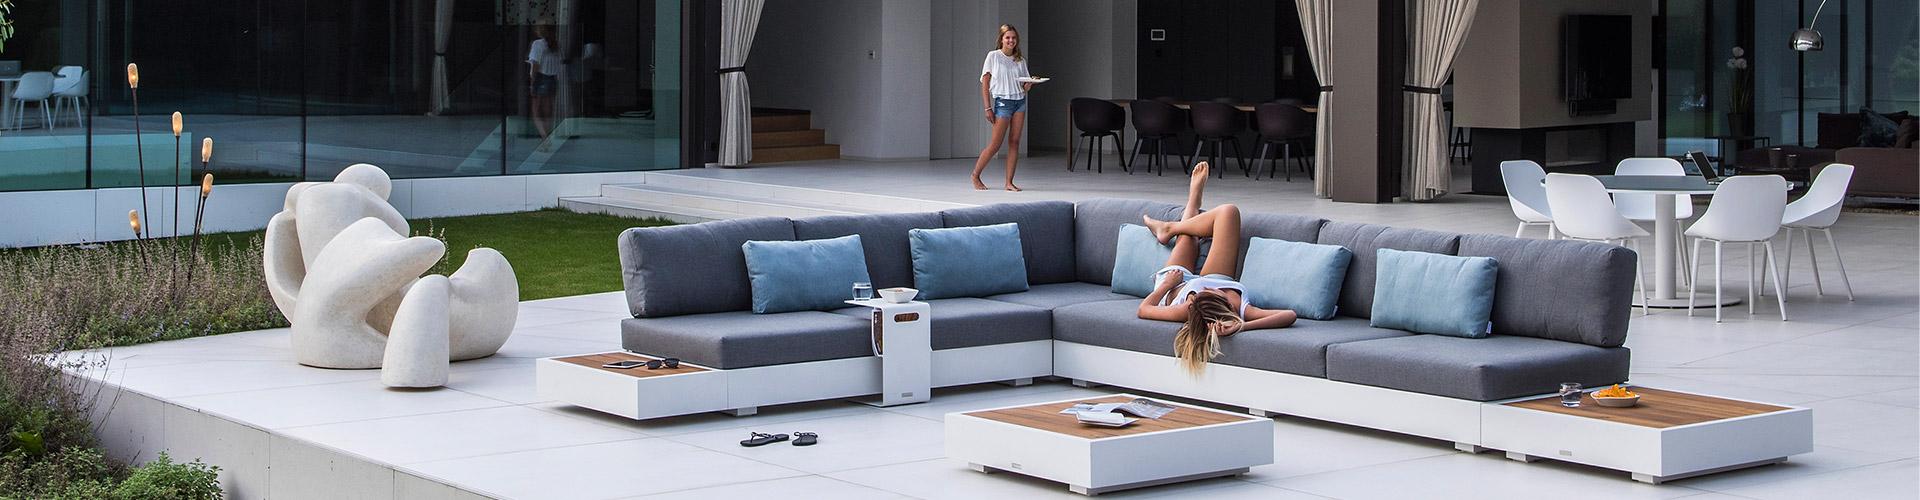 Lounge Möbel Möbelgarten